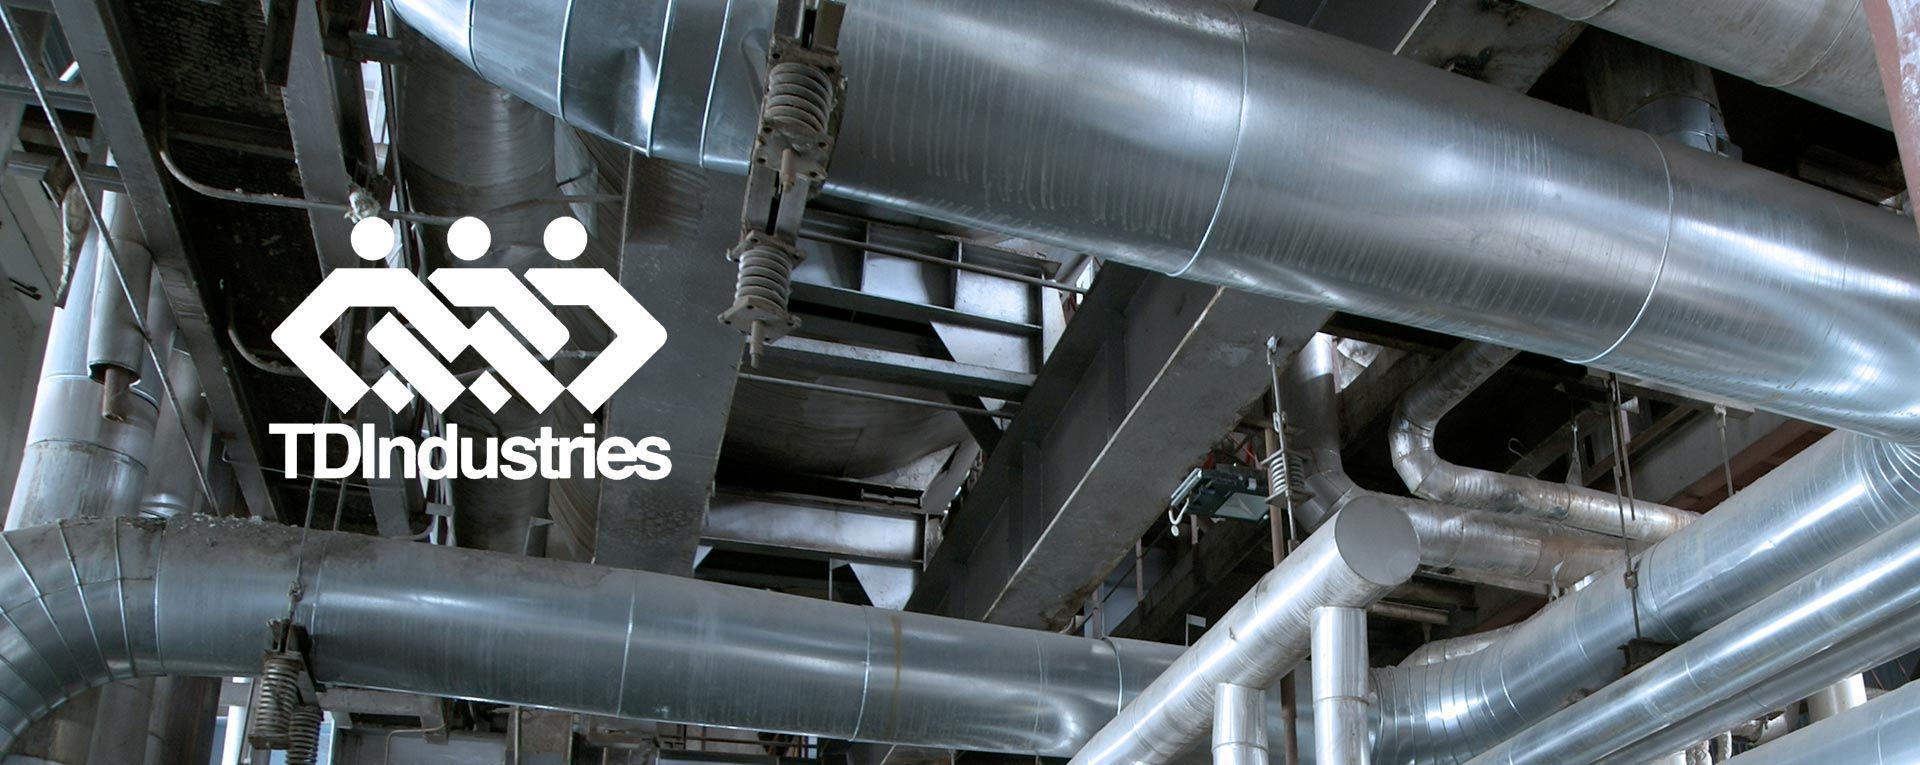 TD Industries Lrg